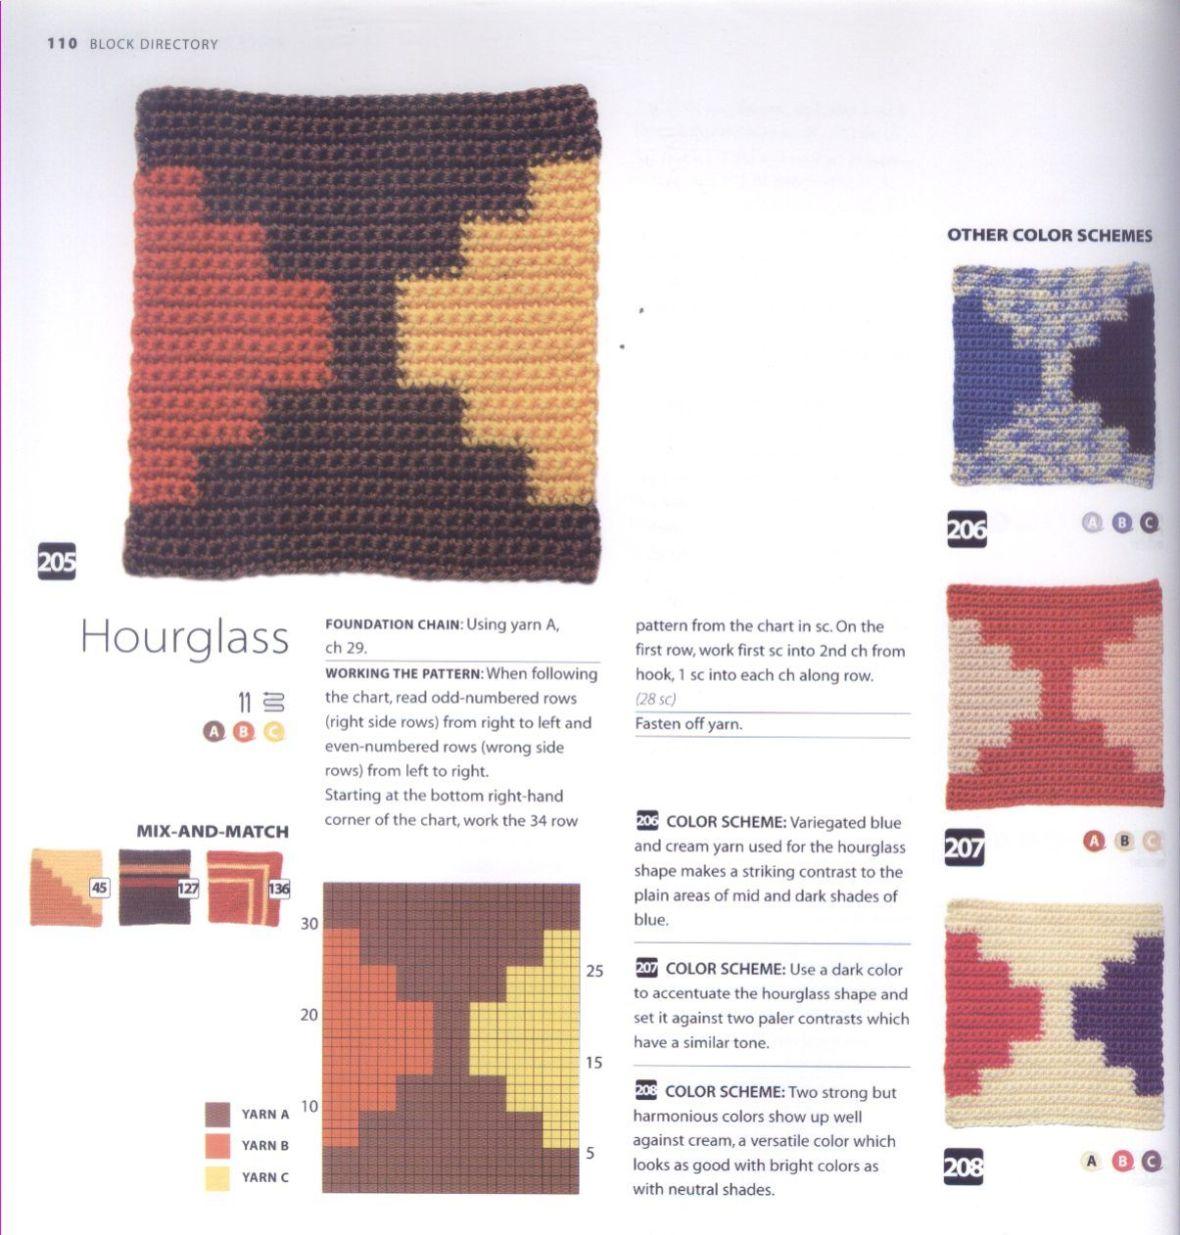 200 Crocheted Blocks for blankets, throws & Afghans 110